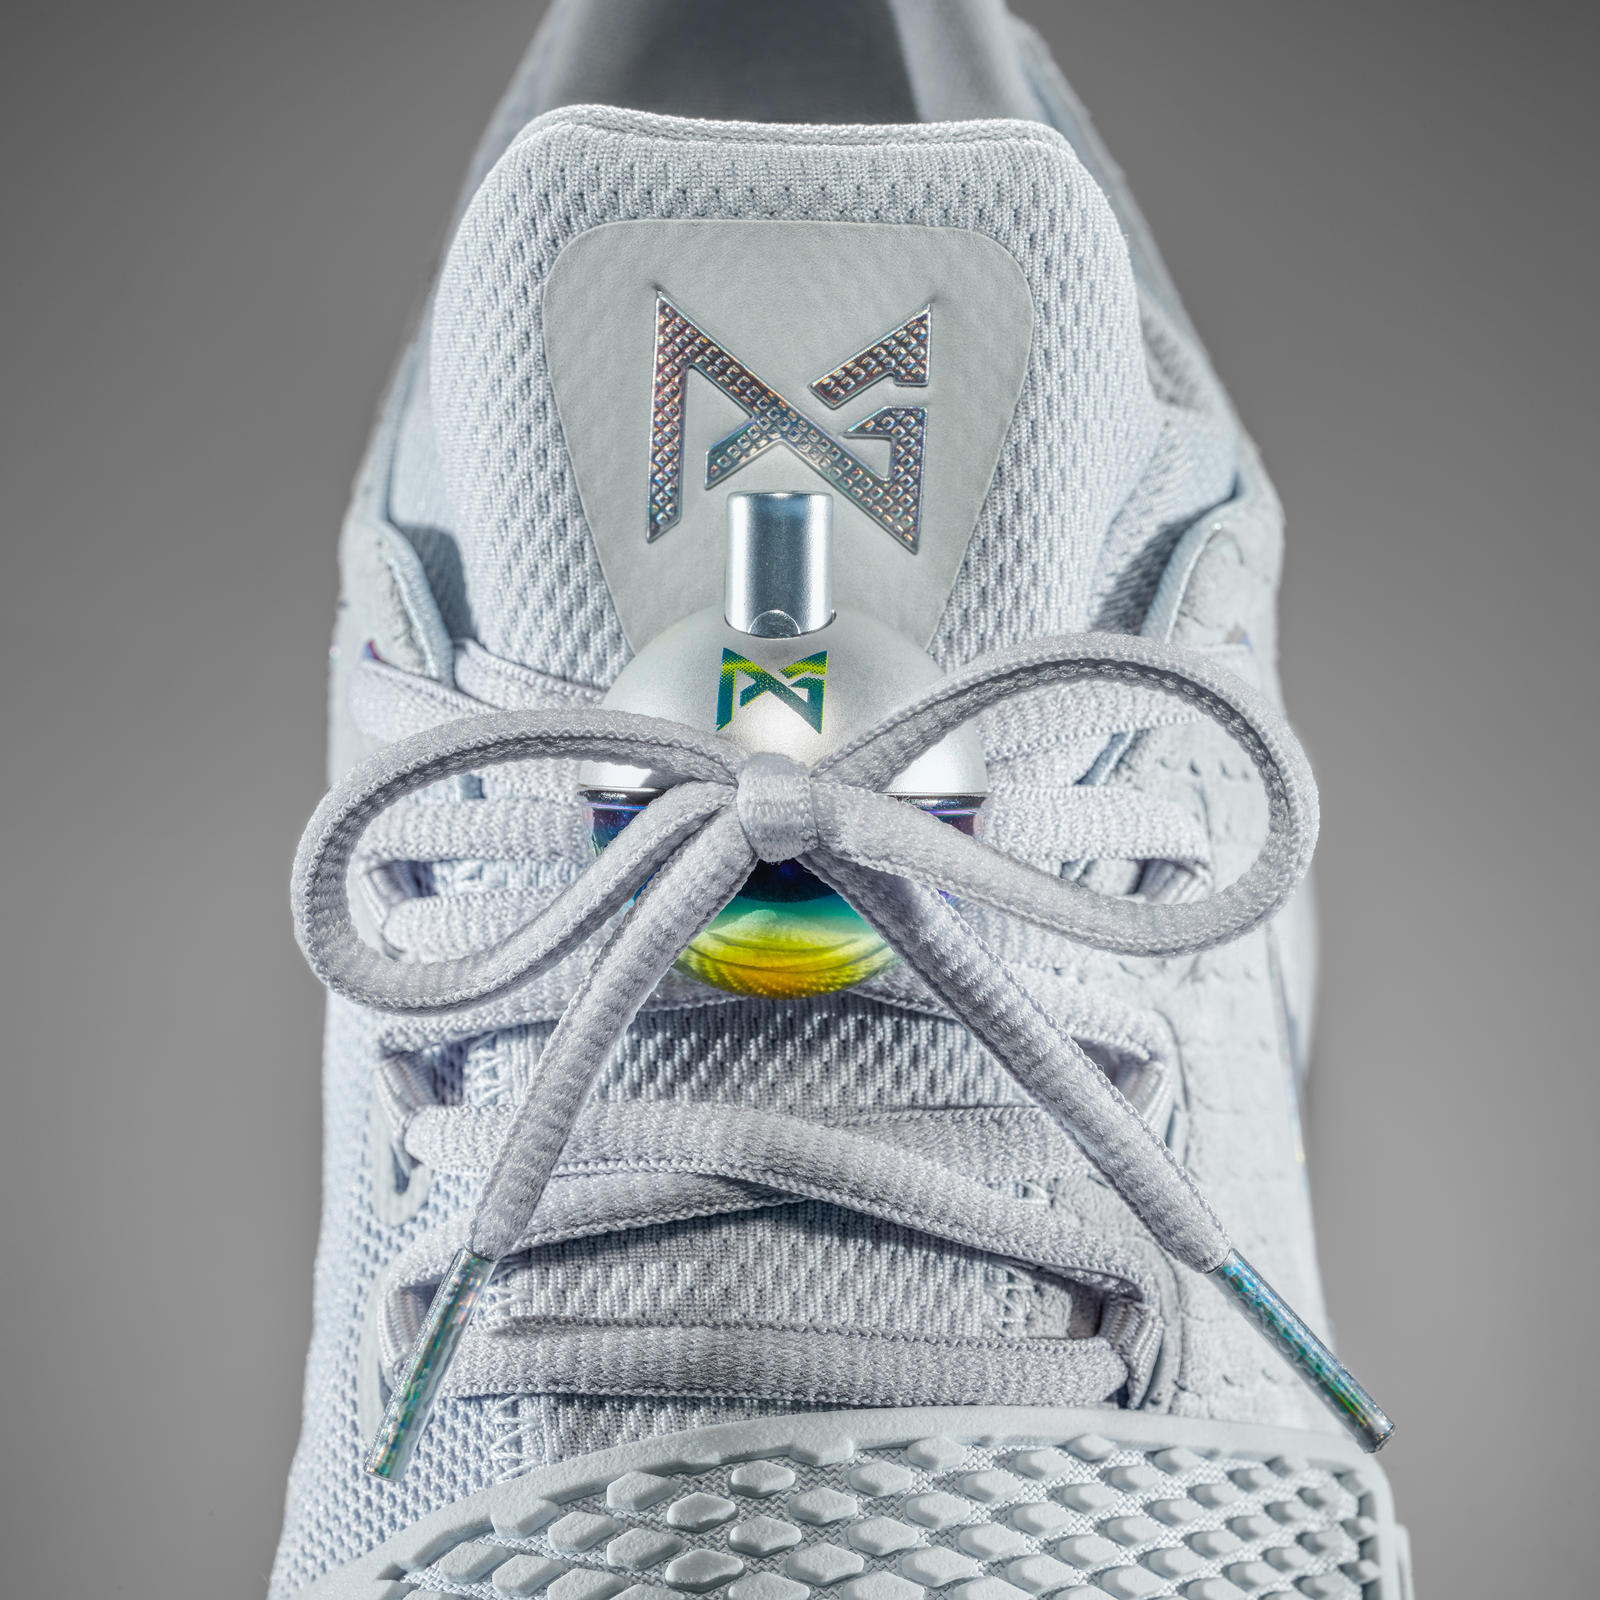 16-420_Nike_PG1_Gray_Tongue-01b_square_1600